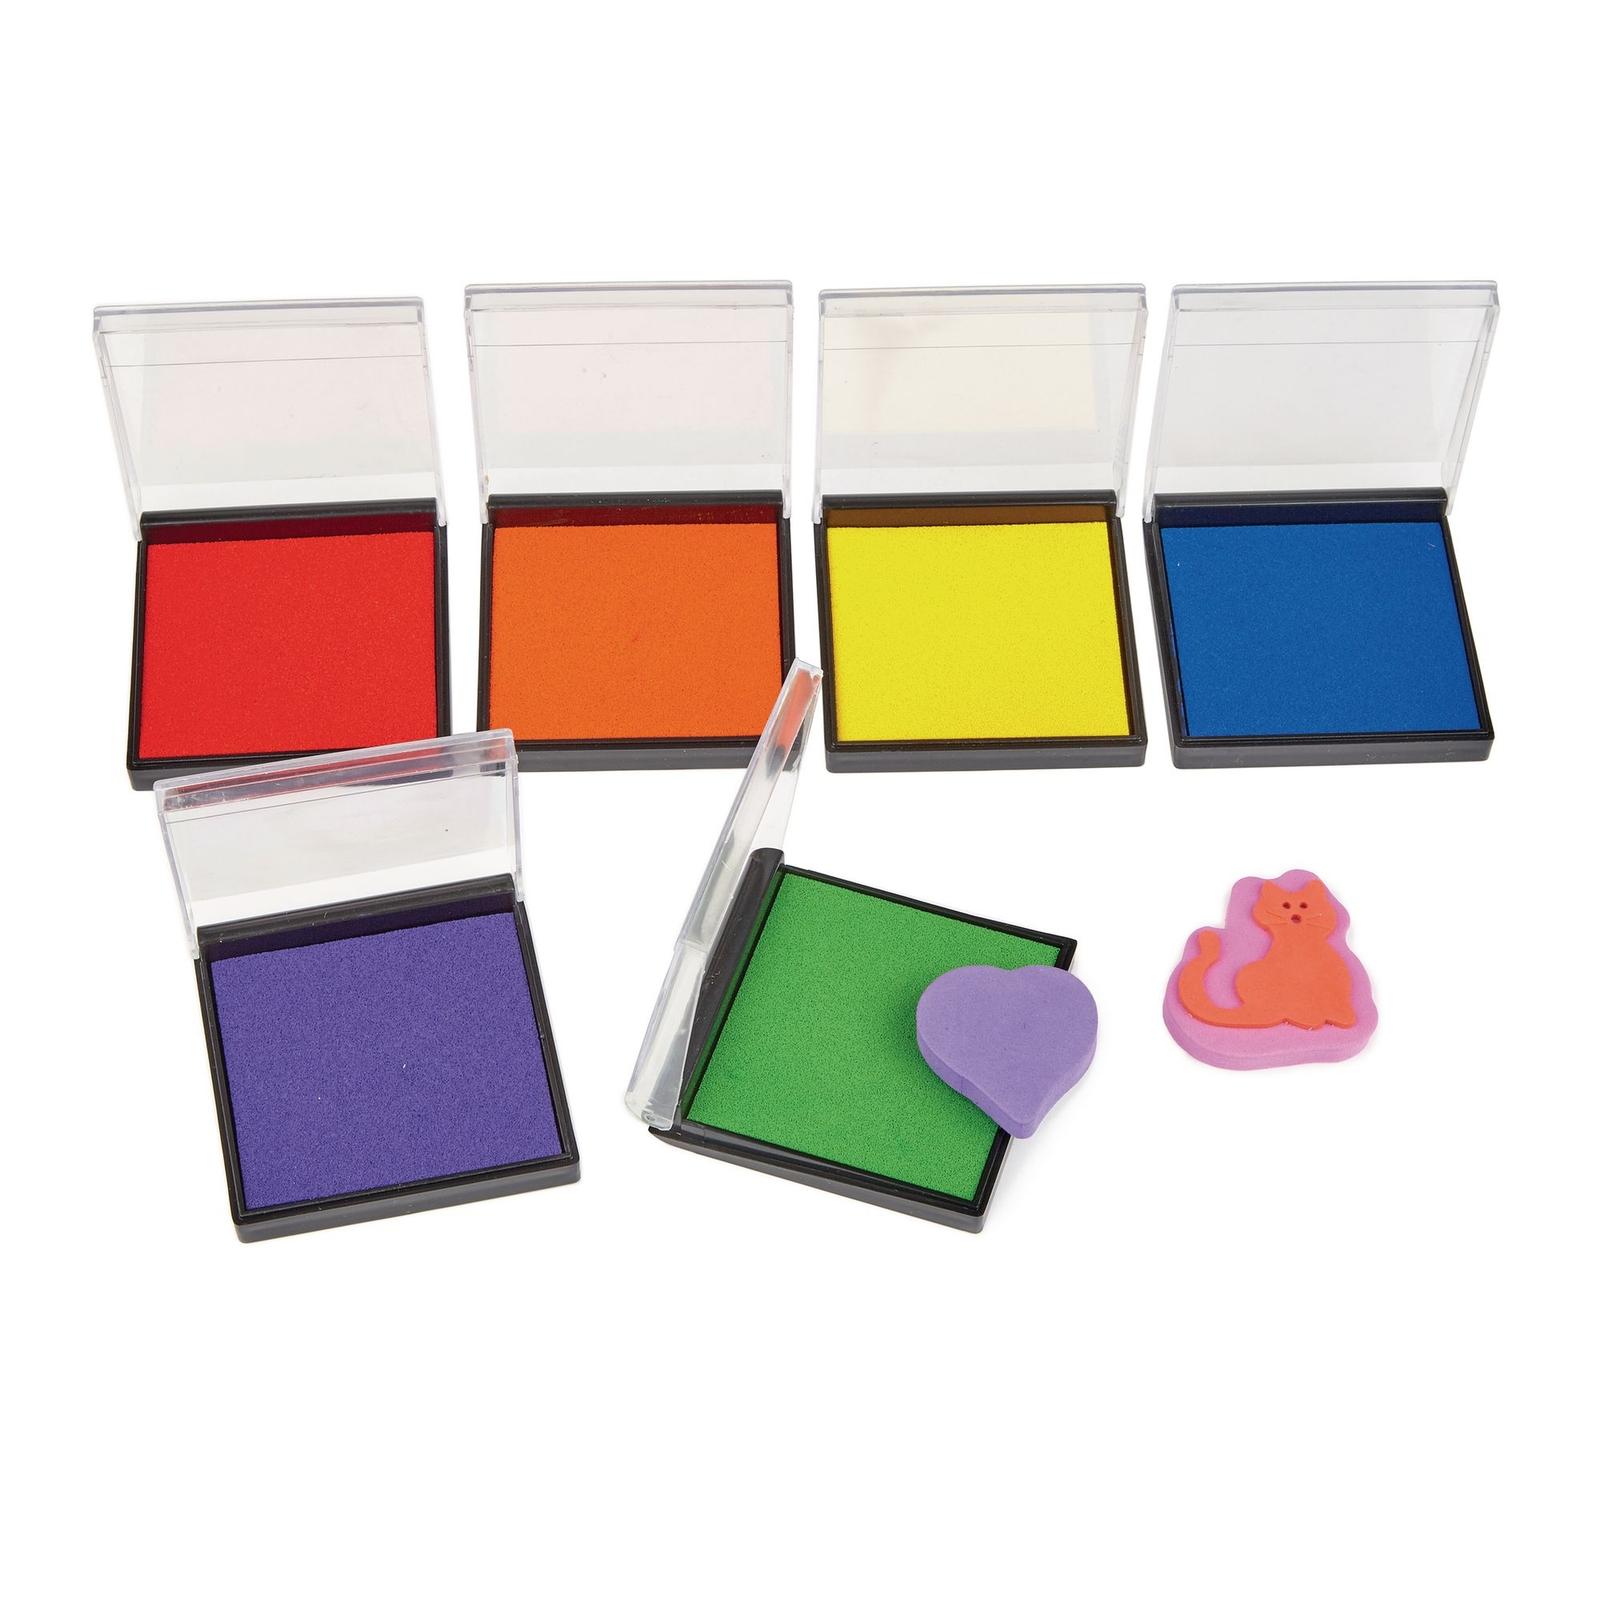 Mini Stamp Pads